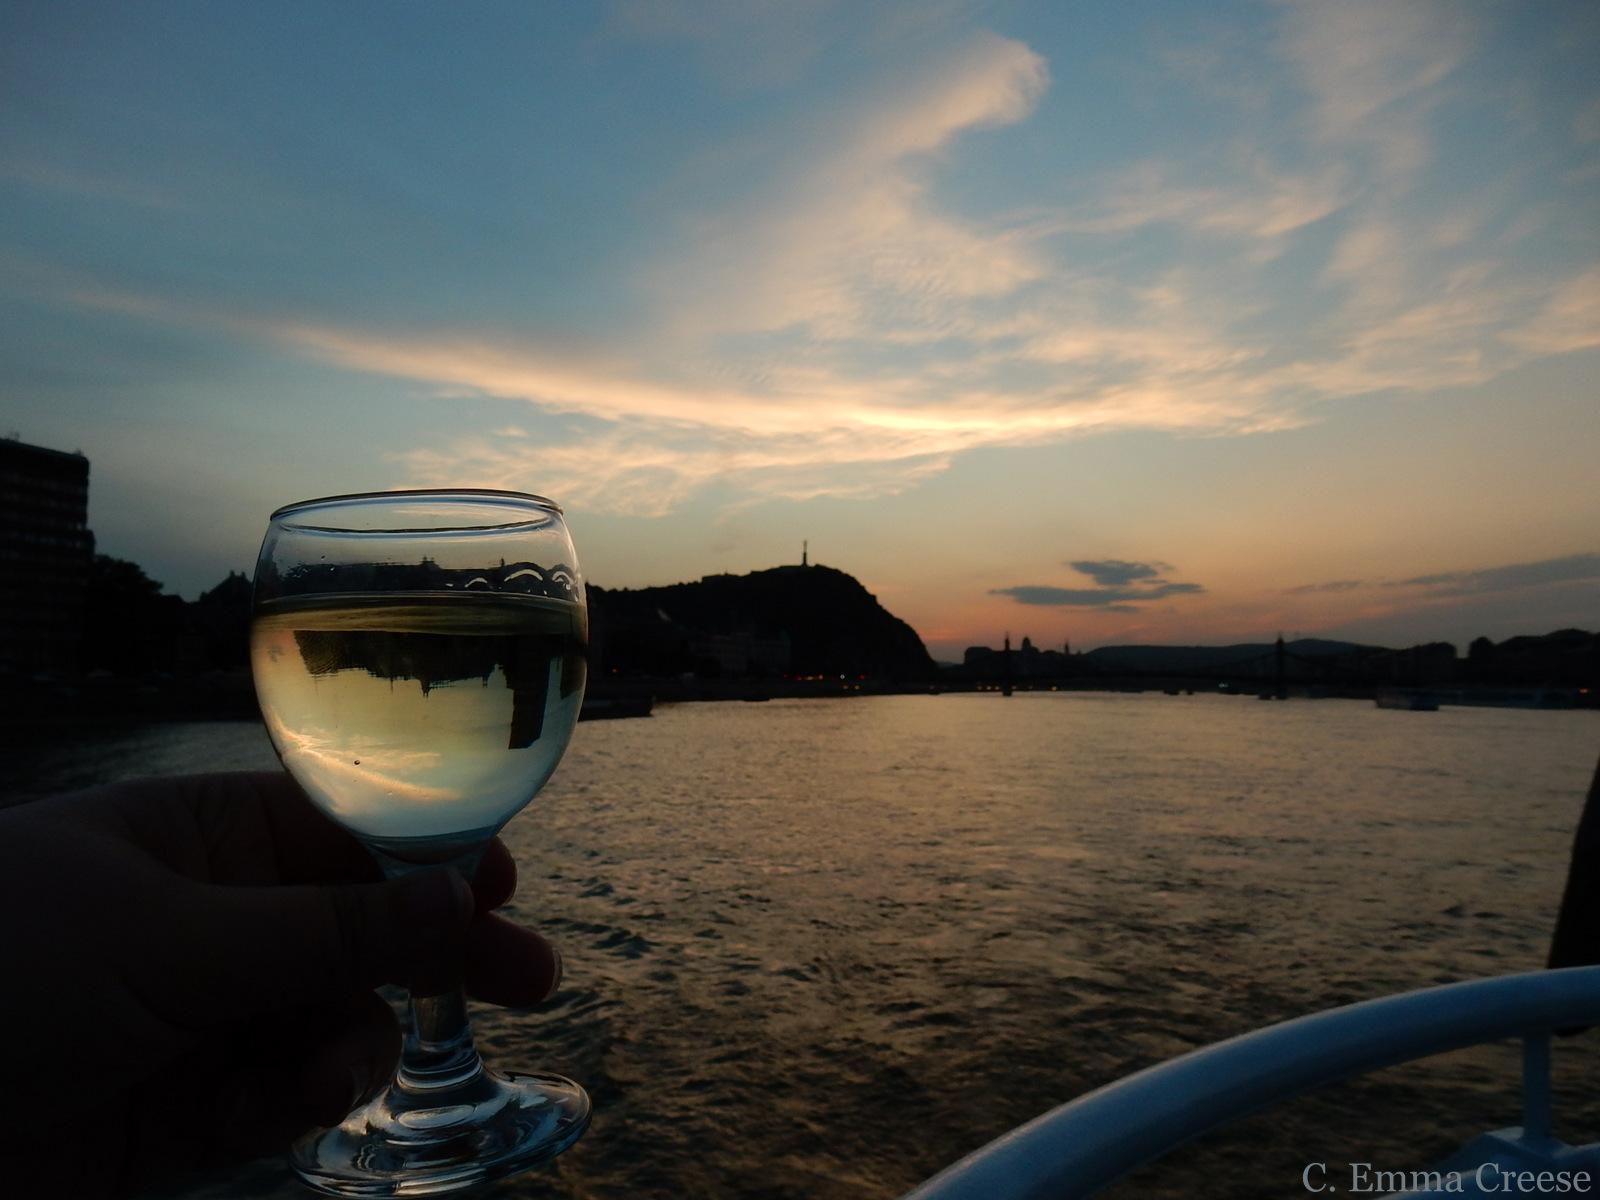 Danube sunset 10 reasons luxury city break Budapest Hungary Adventures of a London Kiwi